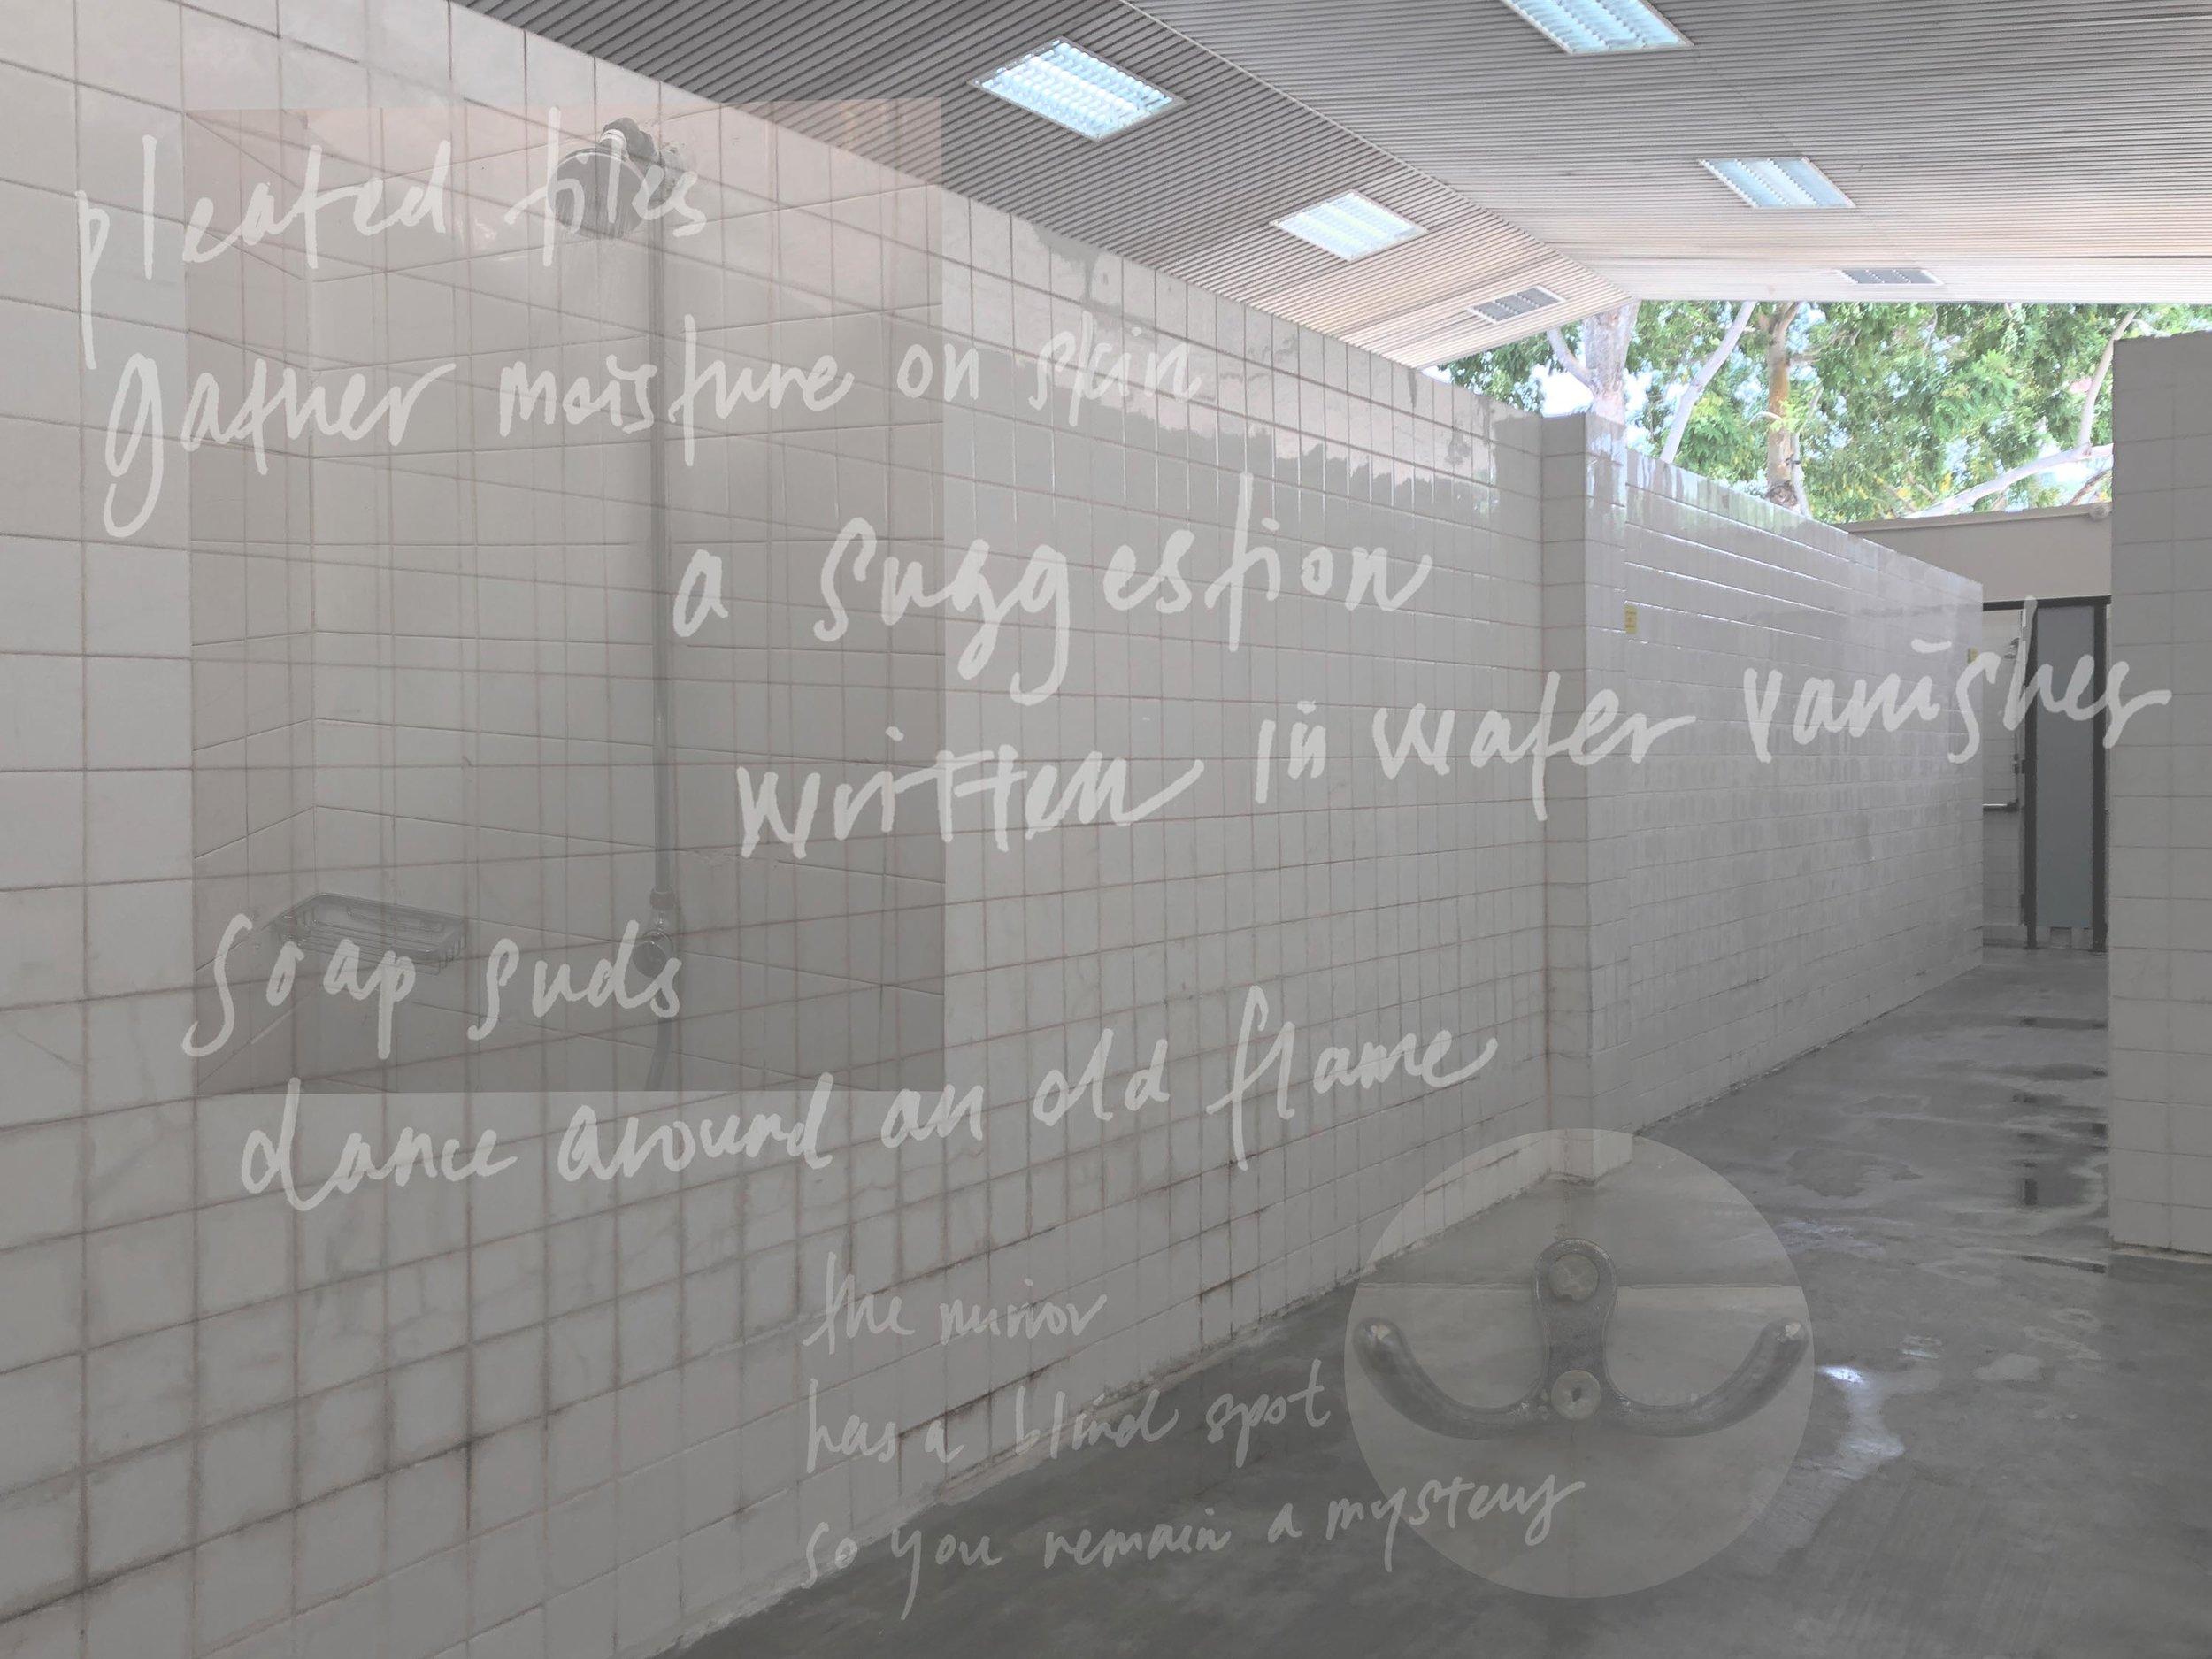 'Linger', a collaborative work by Samantha Yap and Khairullah Rahim. Image courtesy of Samantha Yap.